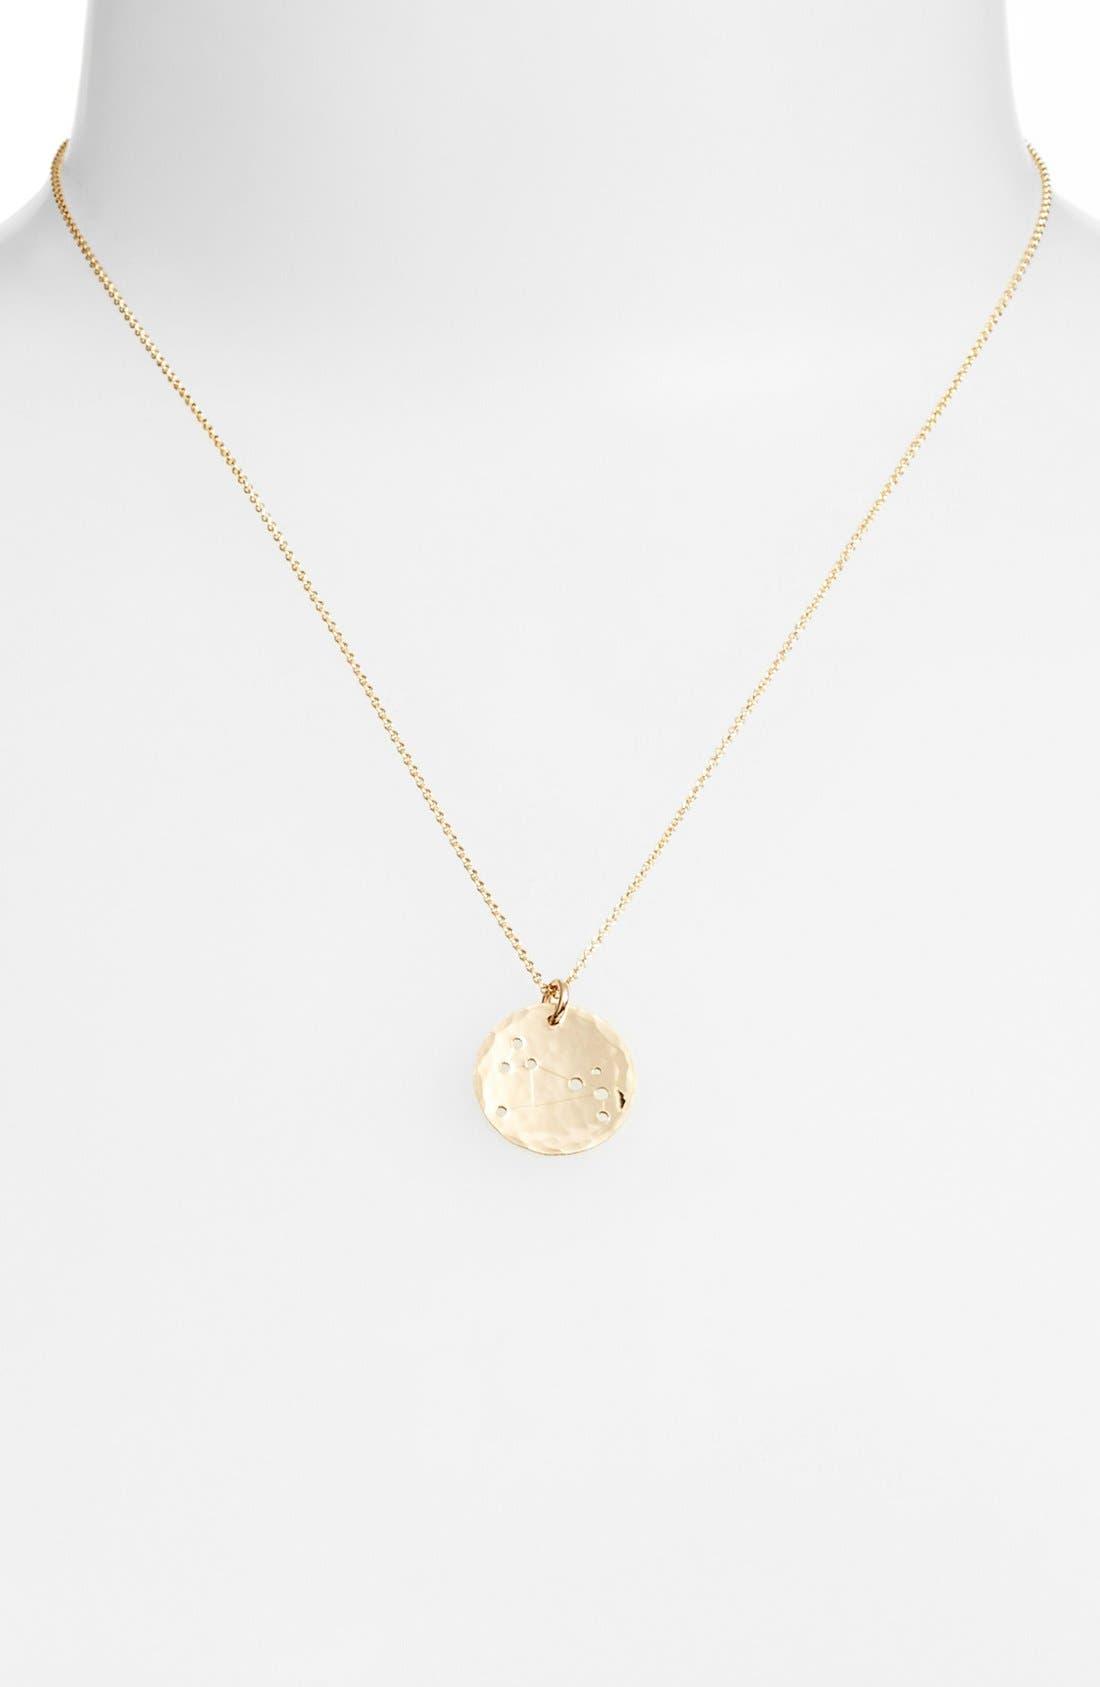 Ija 'Small Zodiac' 14k-Gold Fill Necklace,                             Alternate thumbnail 13, color,